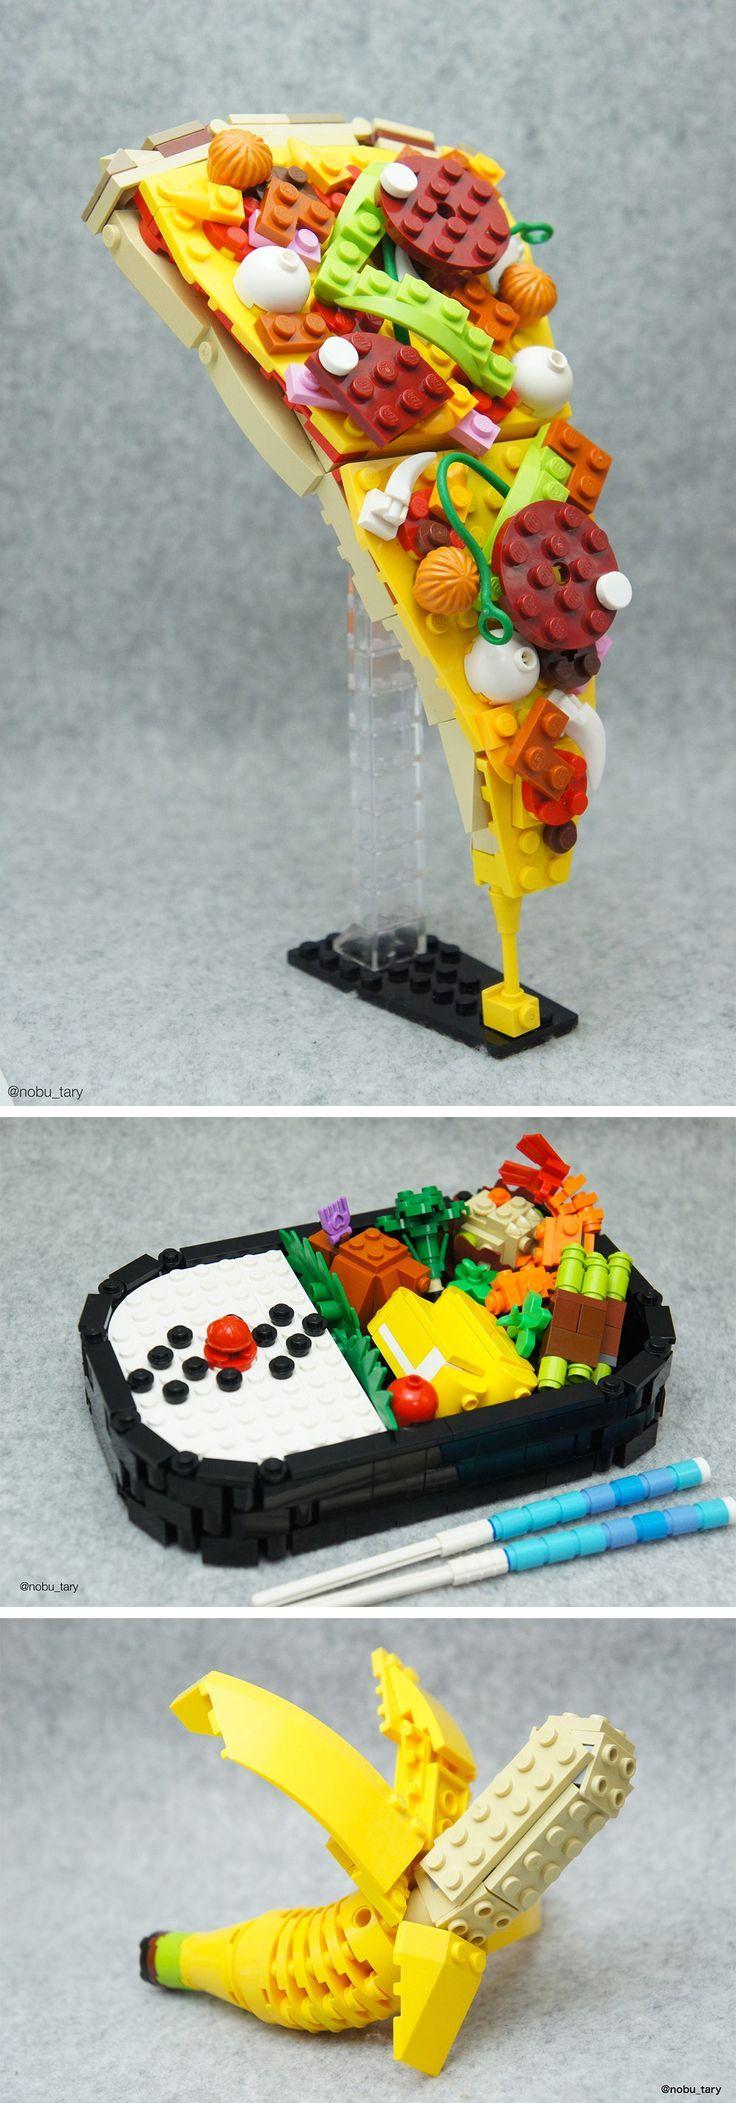 276 best creative lego images on pinterest lego legos for Creative lego ideas